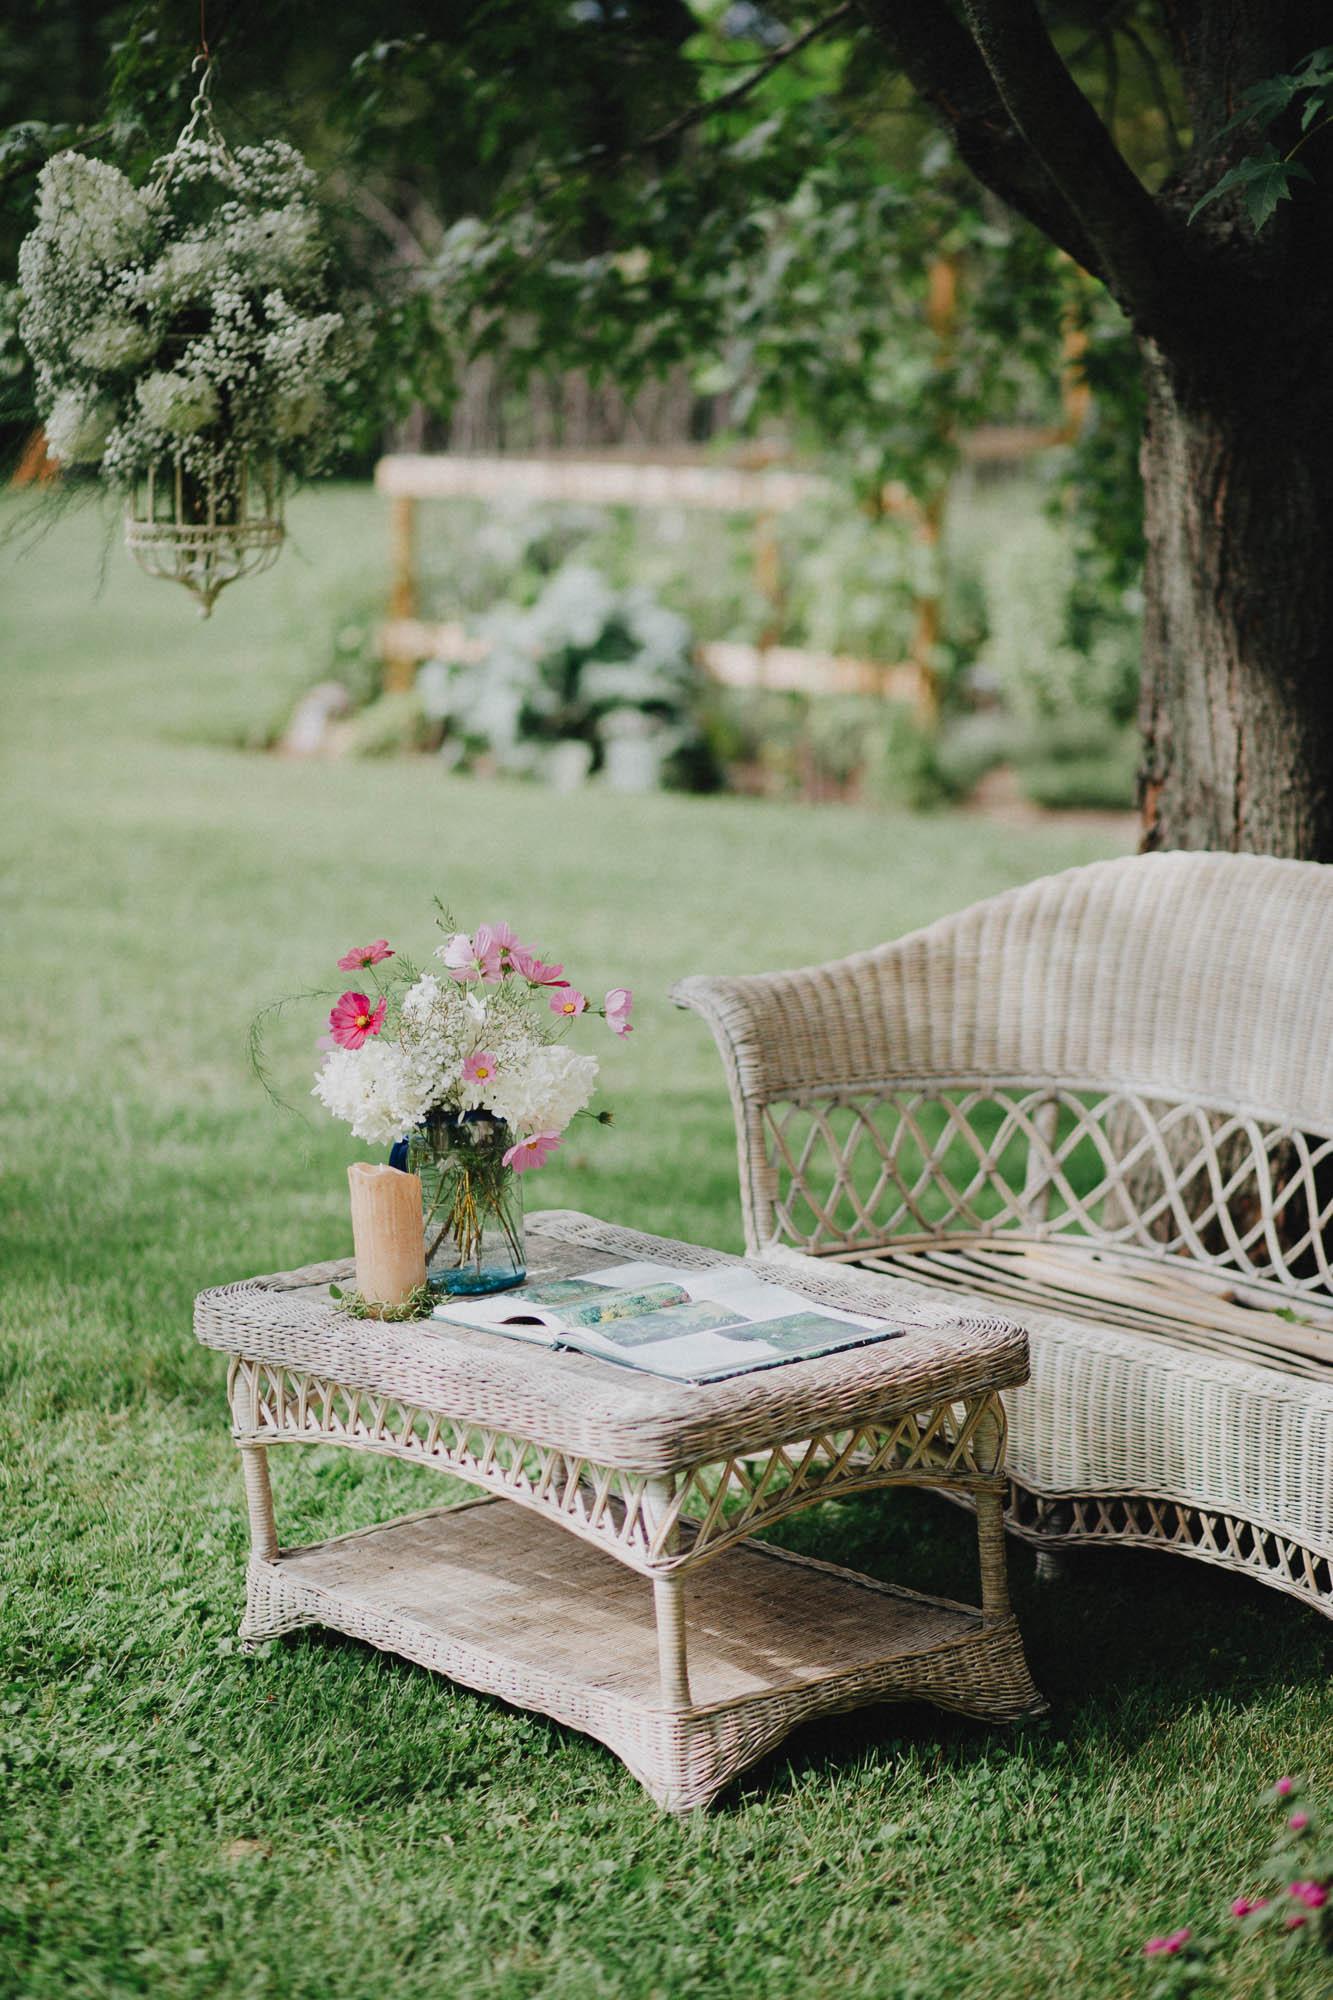 Leah-Graham-Outdoor-DIY-Michigan-Wedding-Details-007@2x.jpg